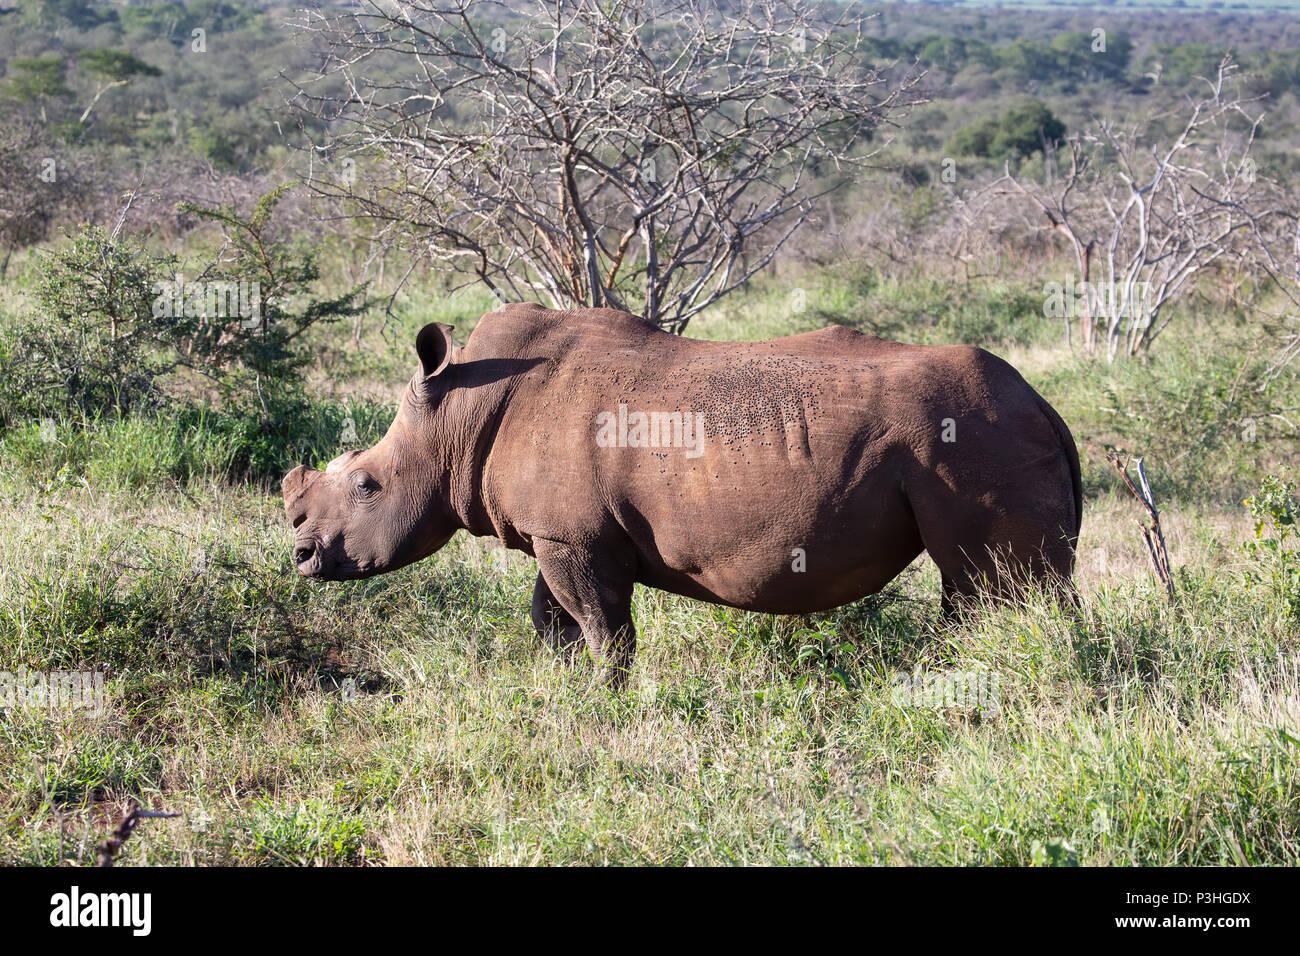 De-horned white rhinoceros Ceratotherium simum roaming in the South African bush - Stock Image